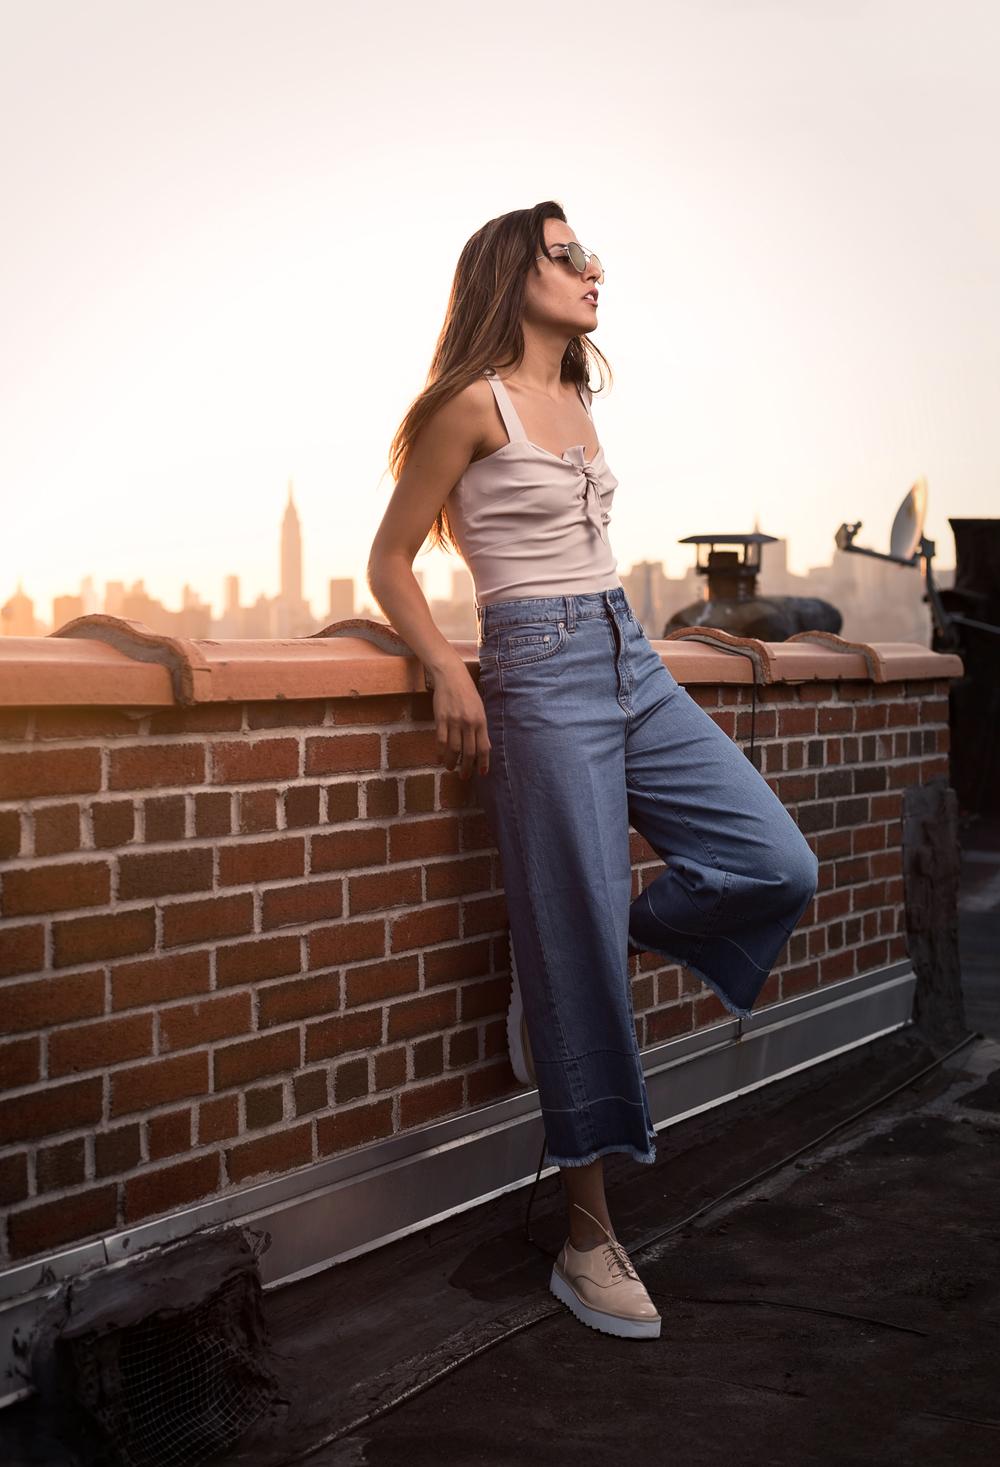 raquel-paiva-blog-de-moda-jeans-culotte